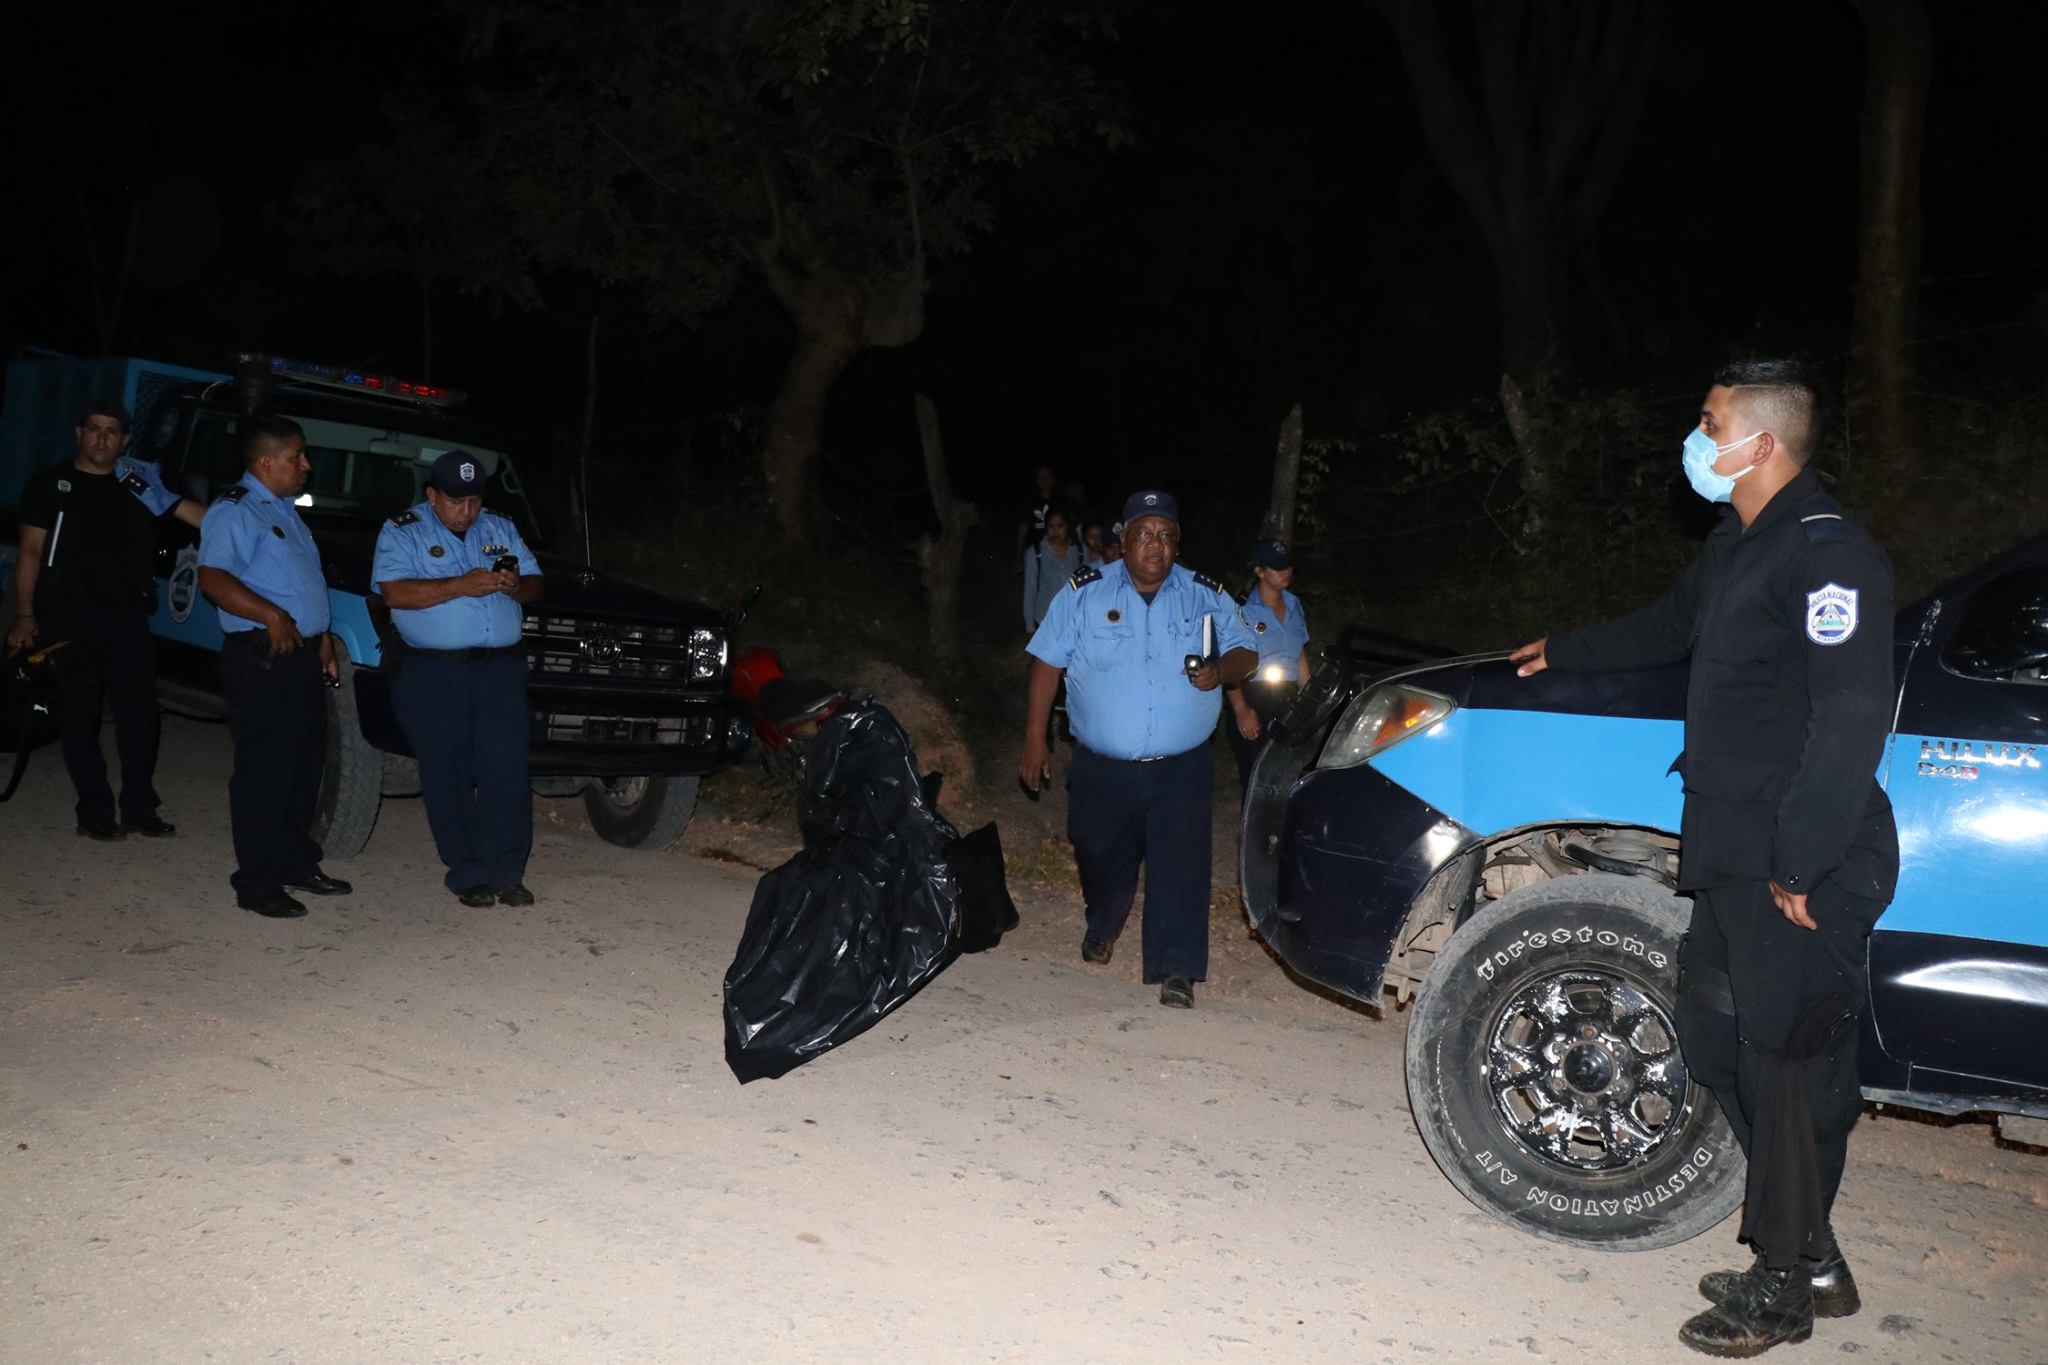 Encuentran muerta a joven que había sido reportada desaparecida en Matagalpa.